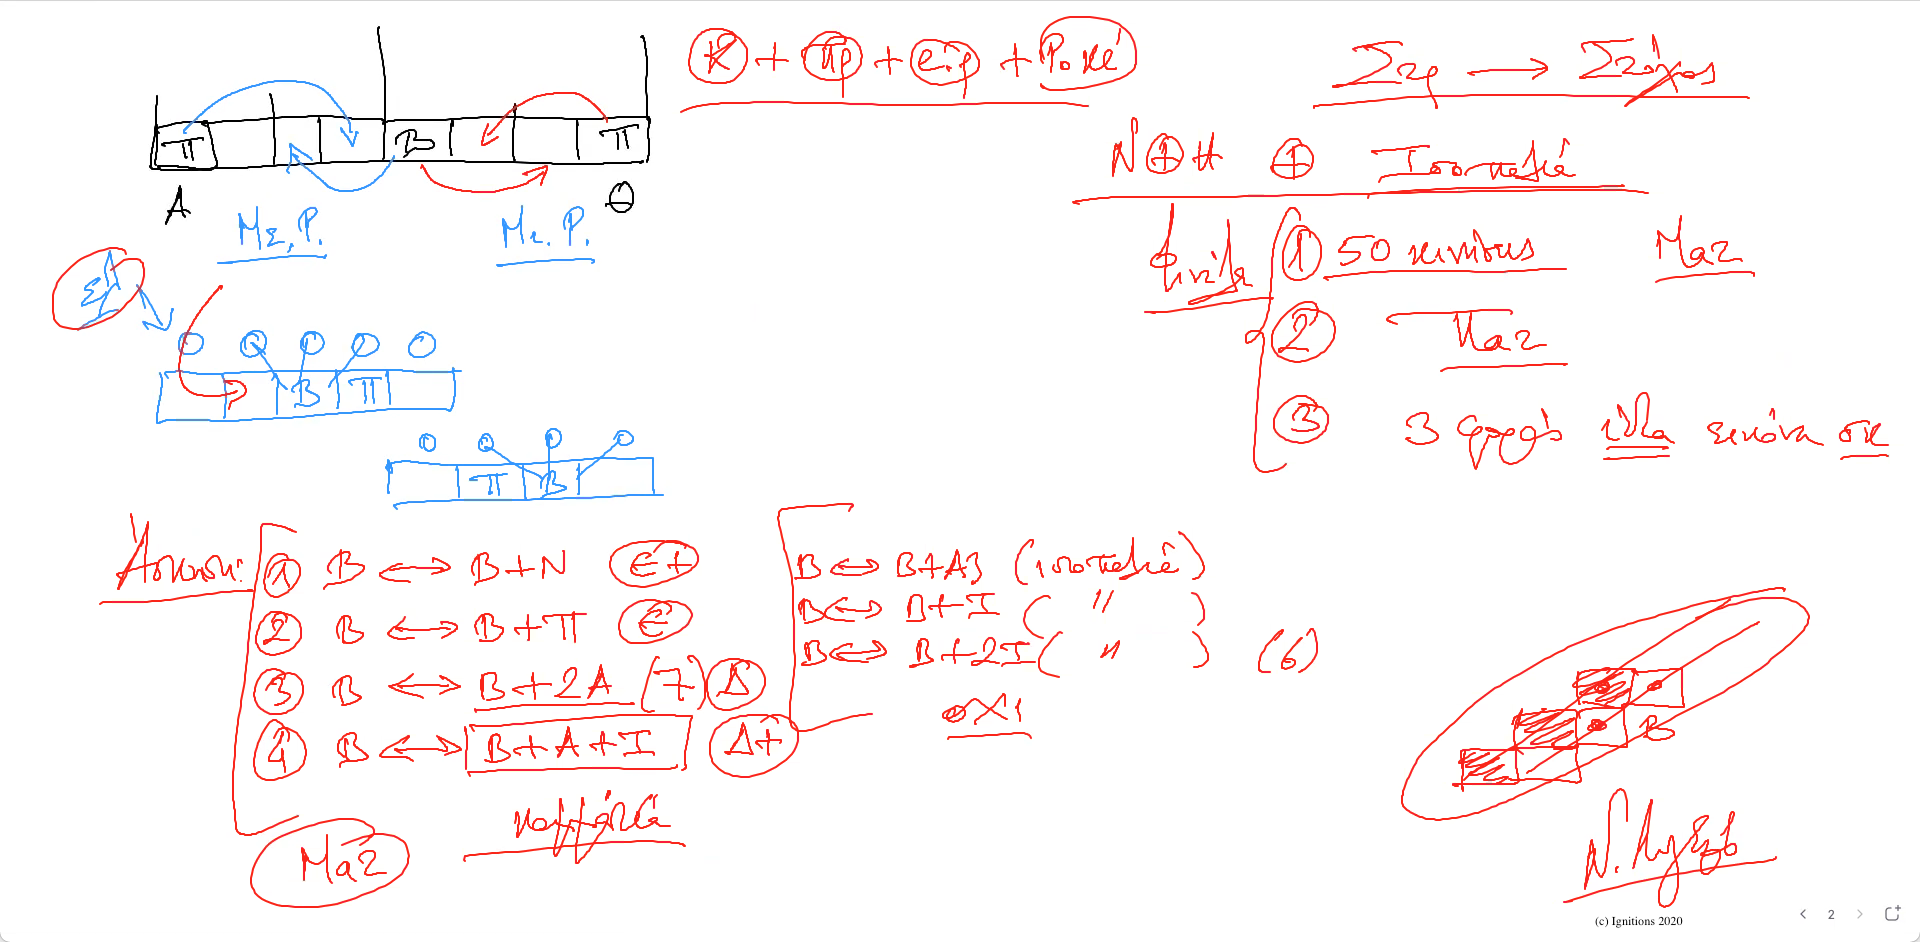 56914 - e-Μάθημα II: Δομική εισαγωγή στο σκάκι. (Dessin)